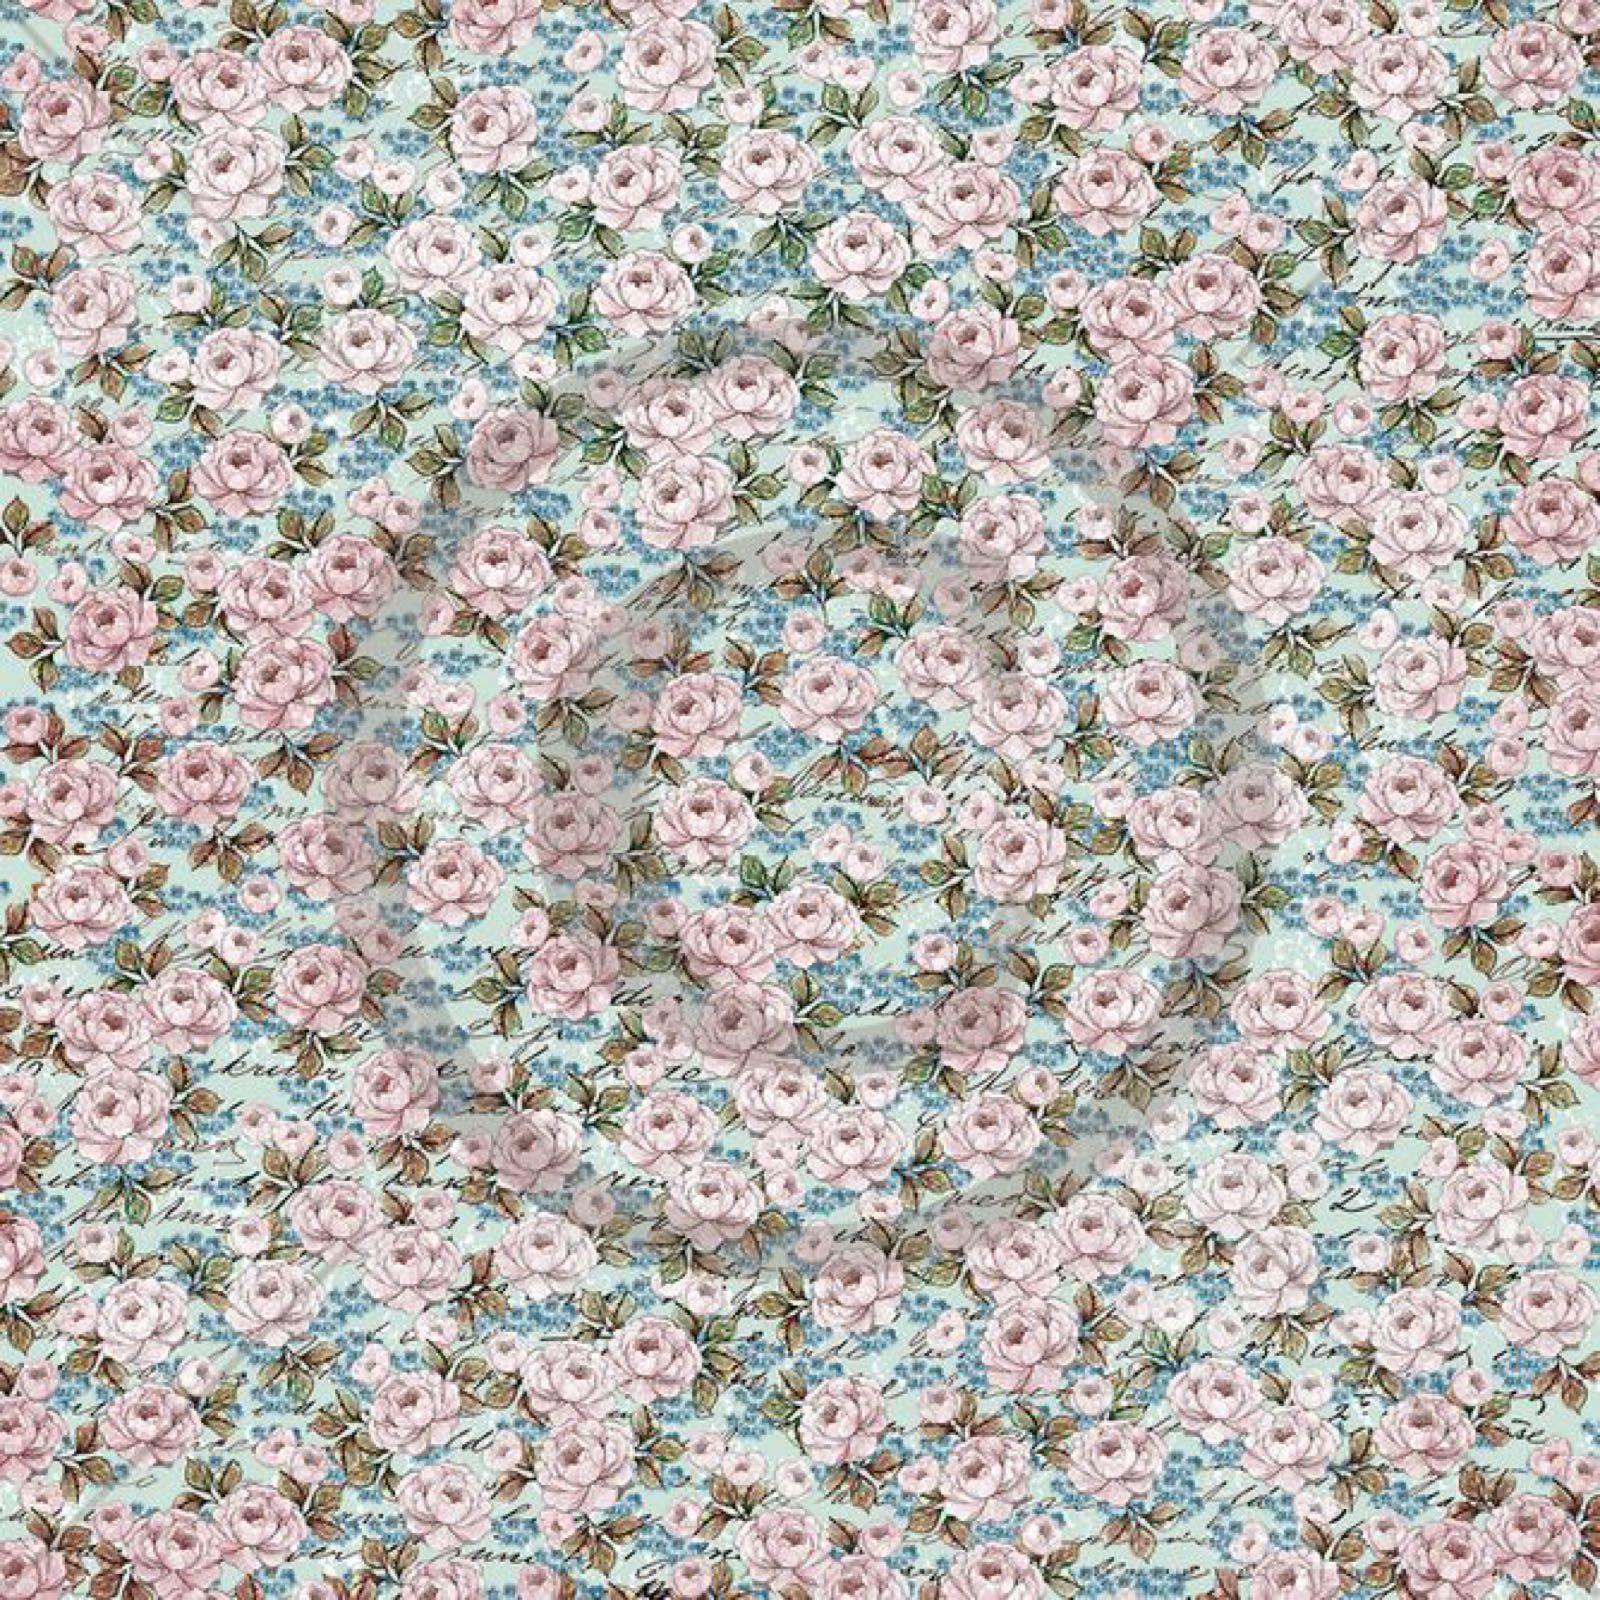 Papirdesign mønsterark 12x12: håpefull rosebusk